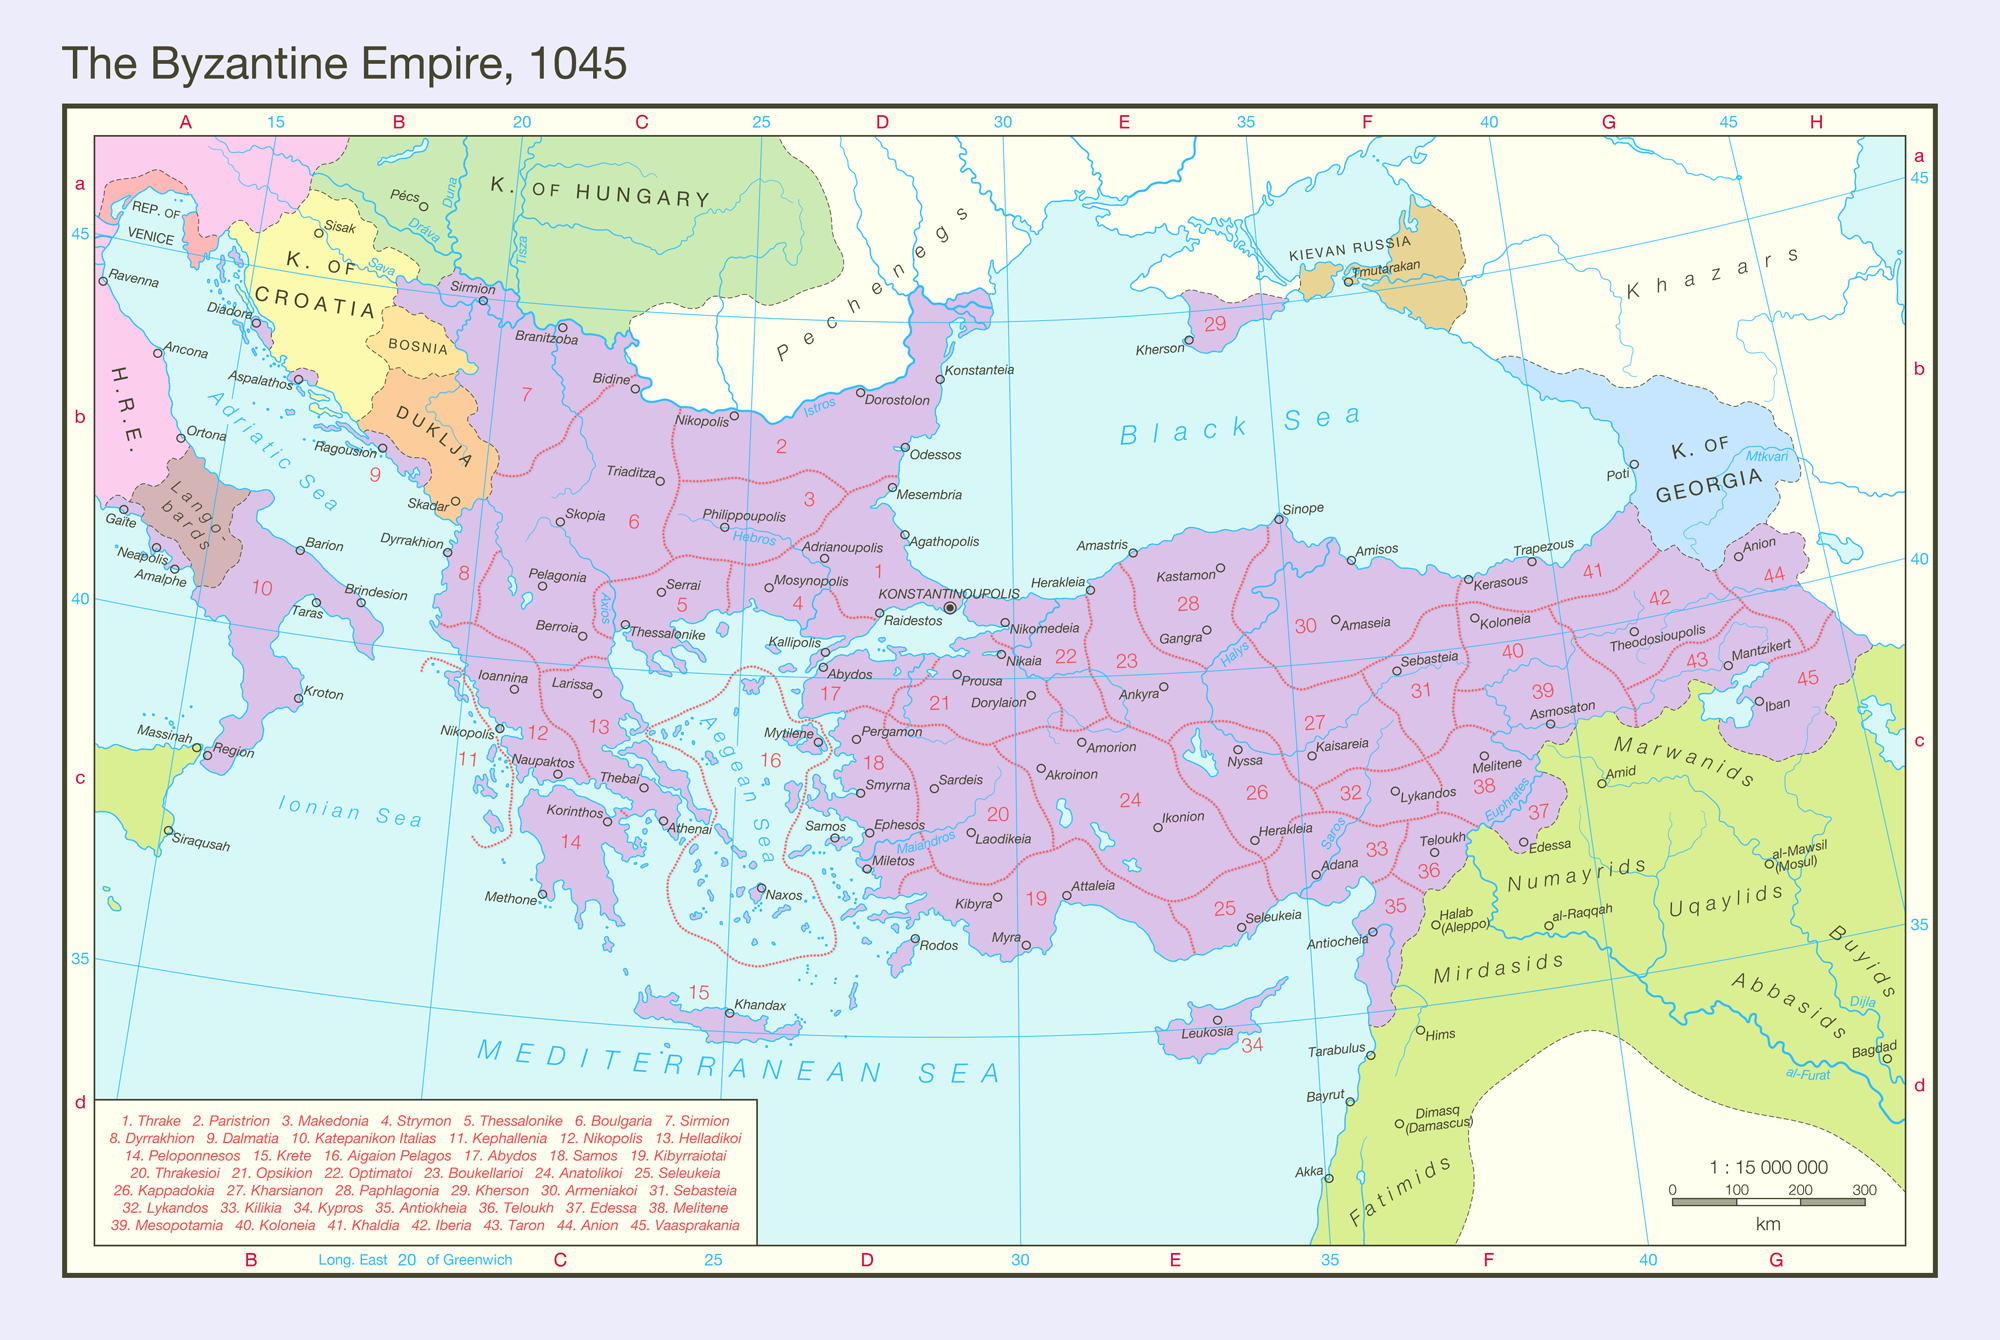 The Byzantine Empire, 1045